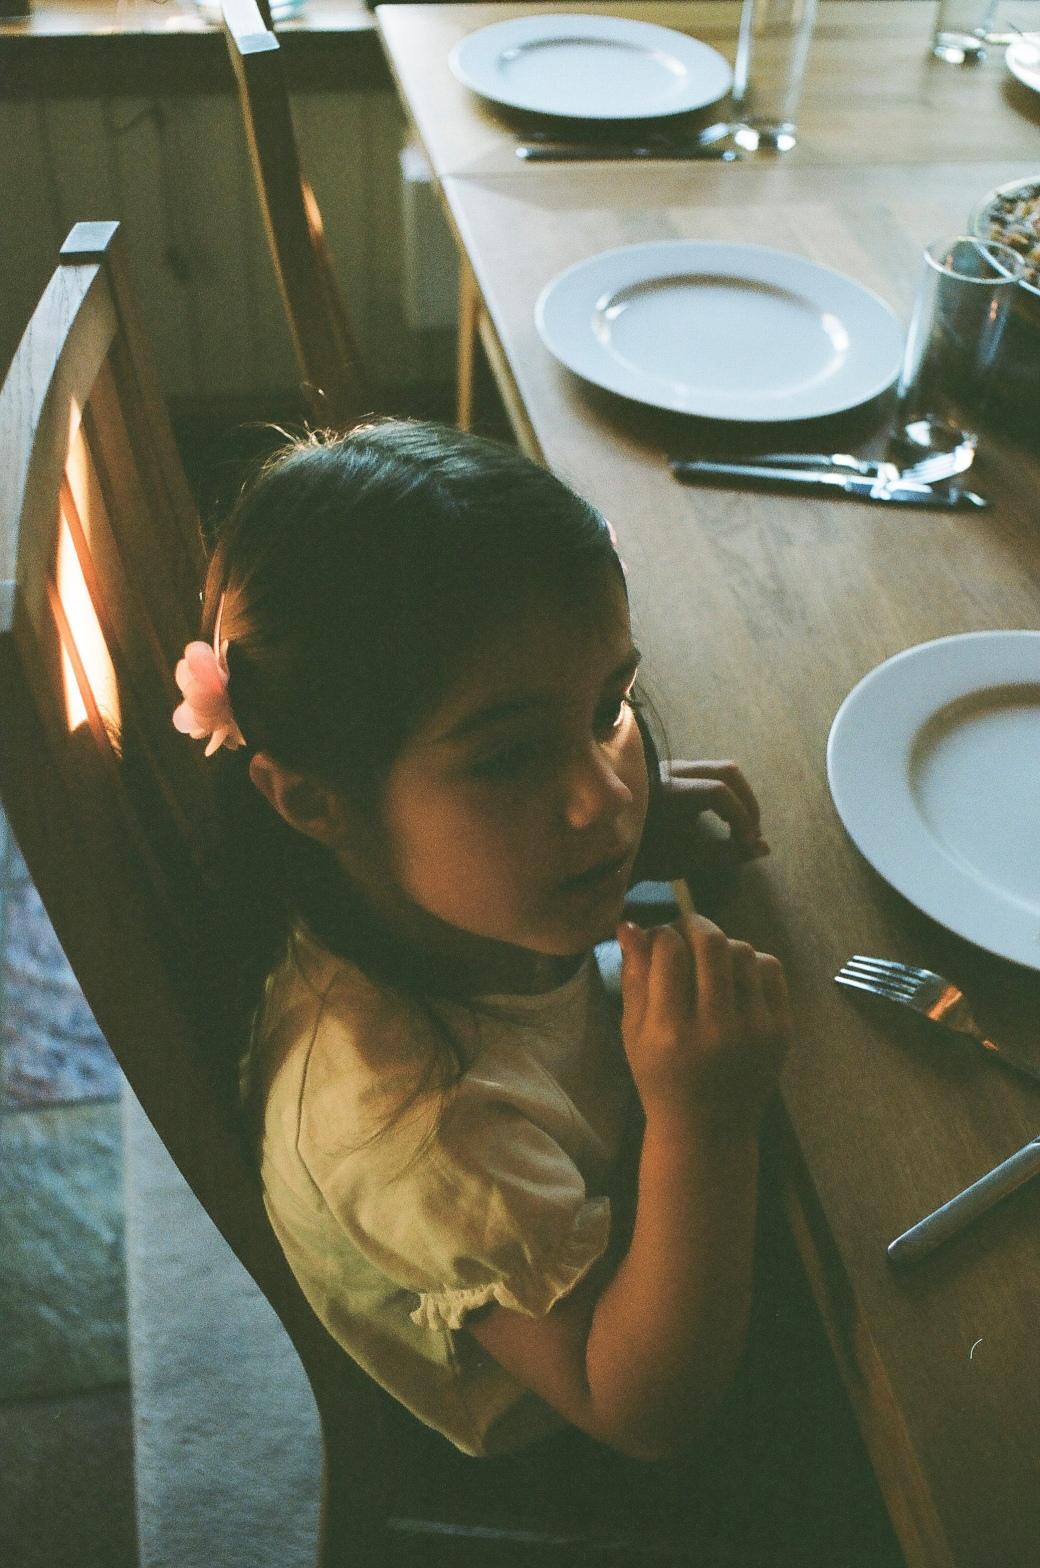 sta%cc%8aende-thea-ved-middagsbordet